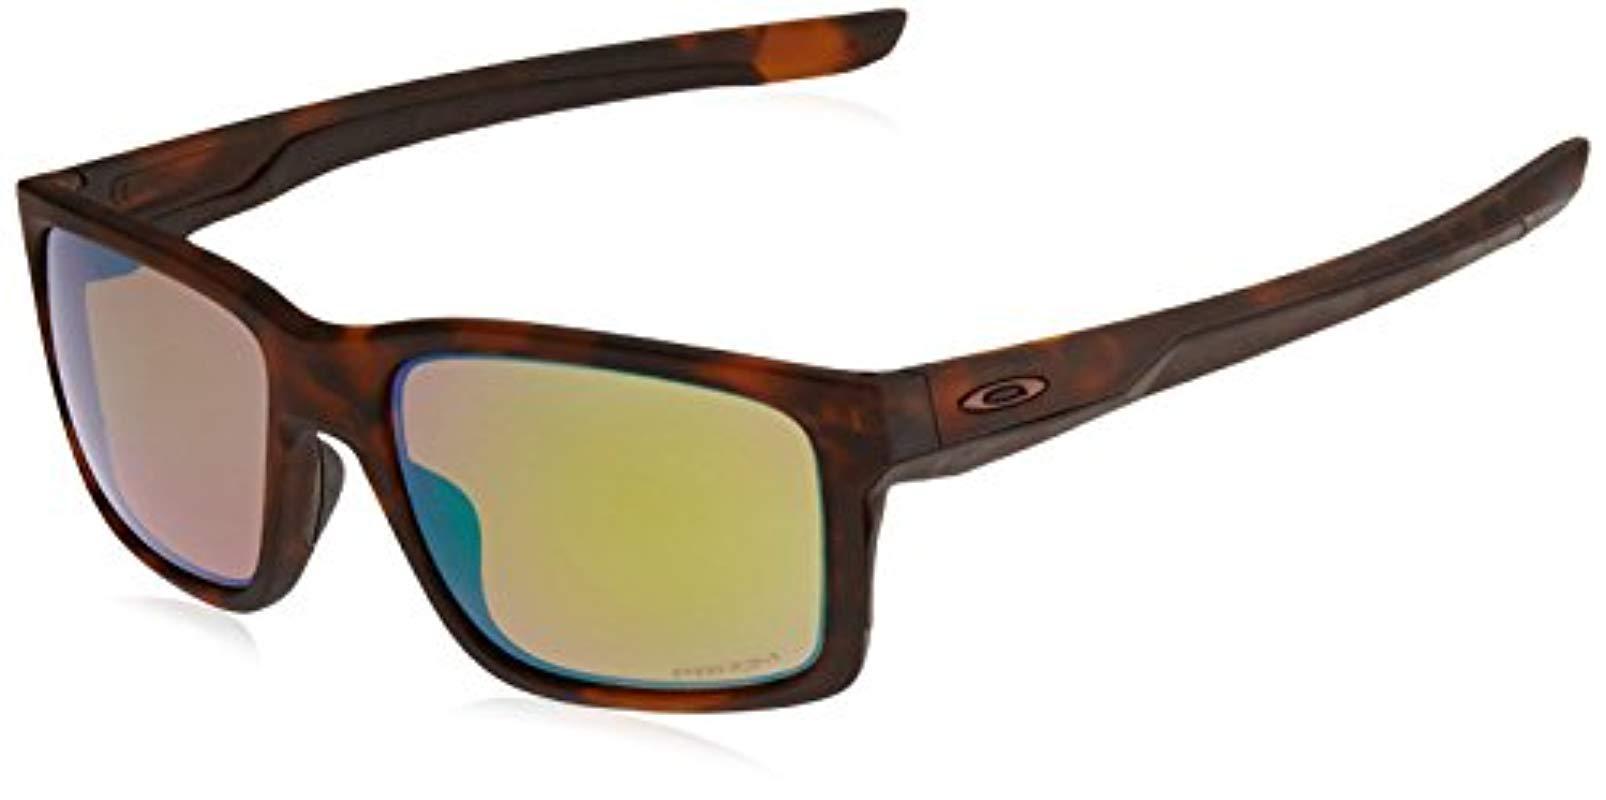 211013ae469 Oakley - Brown Sliver Polarized Rectangular Sunglasses - Lyst. View  fullscreen